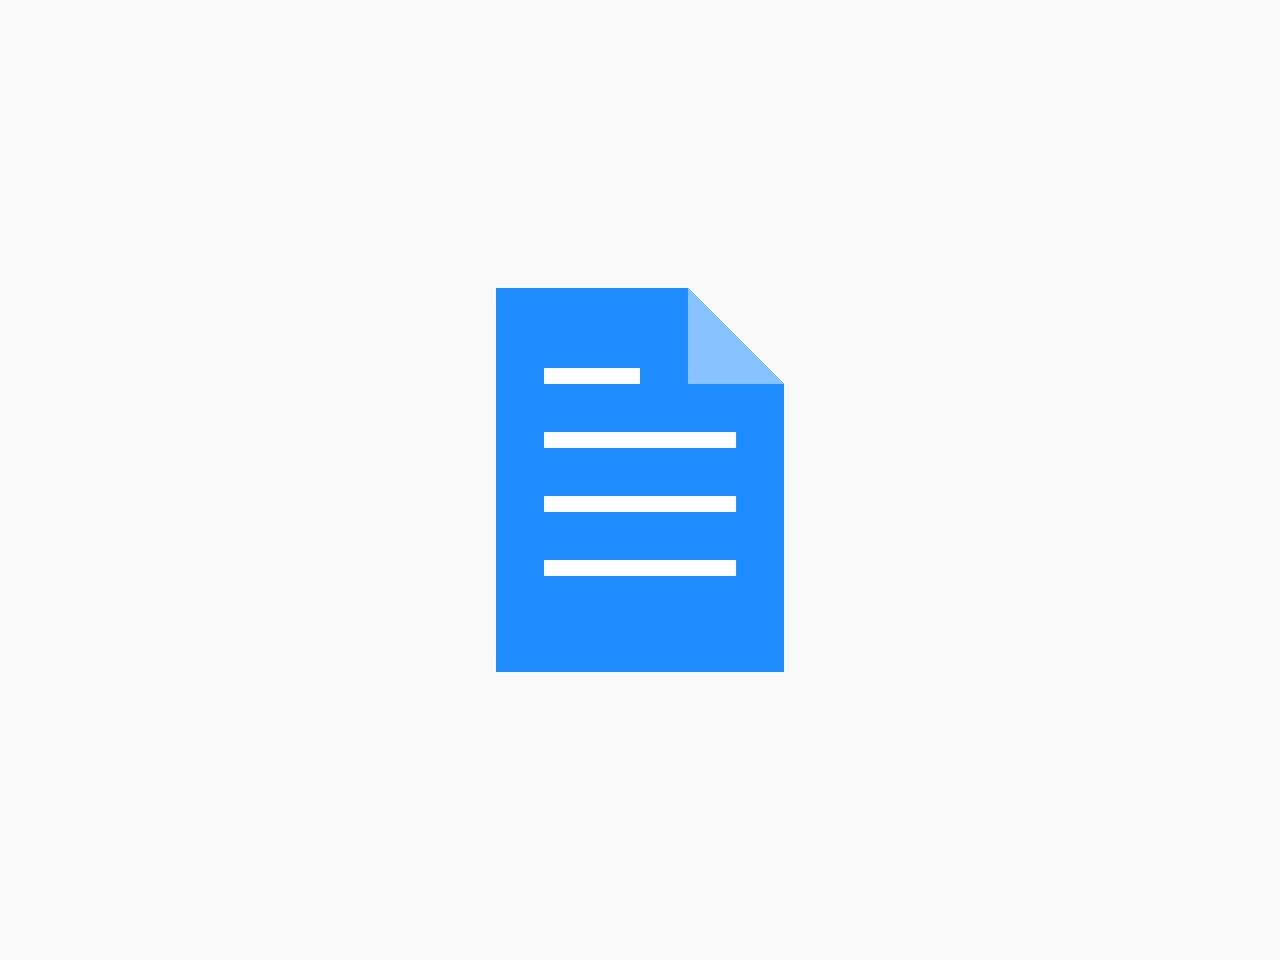 Trauma in the jury box